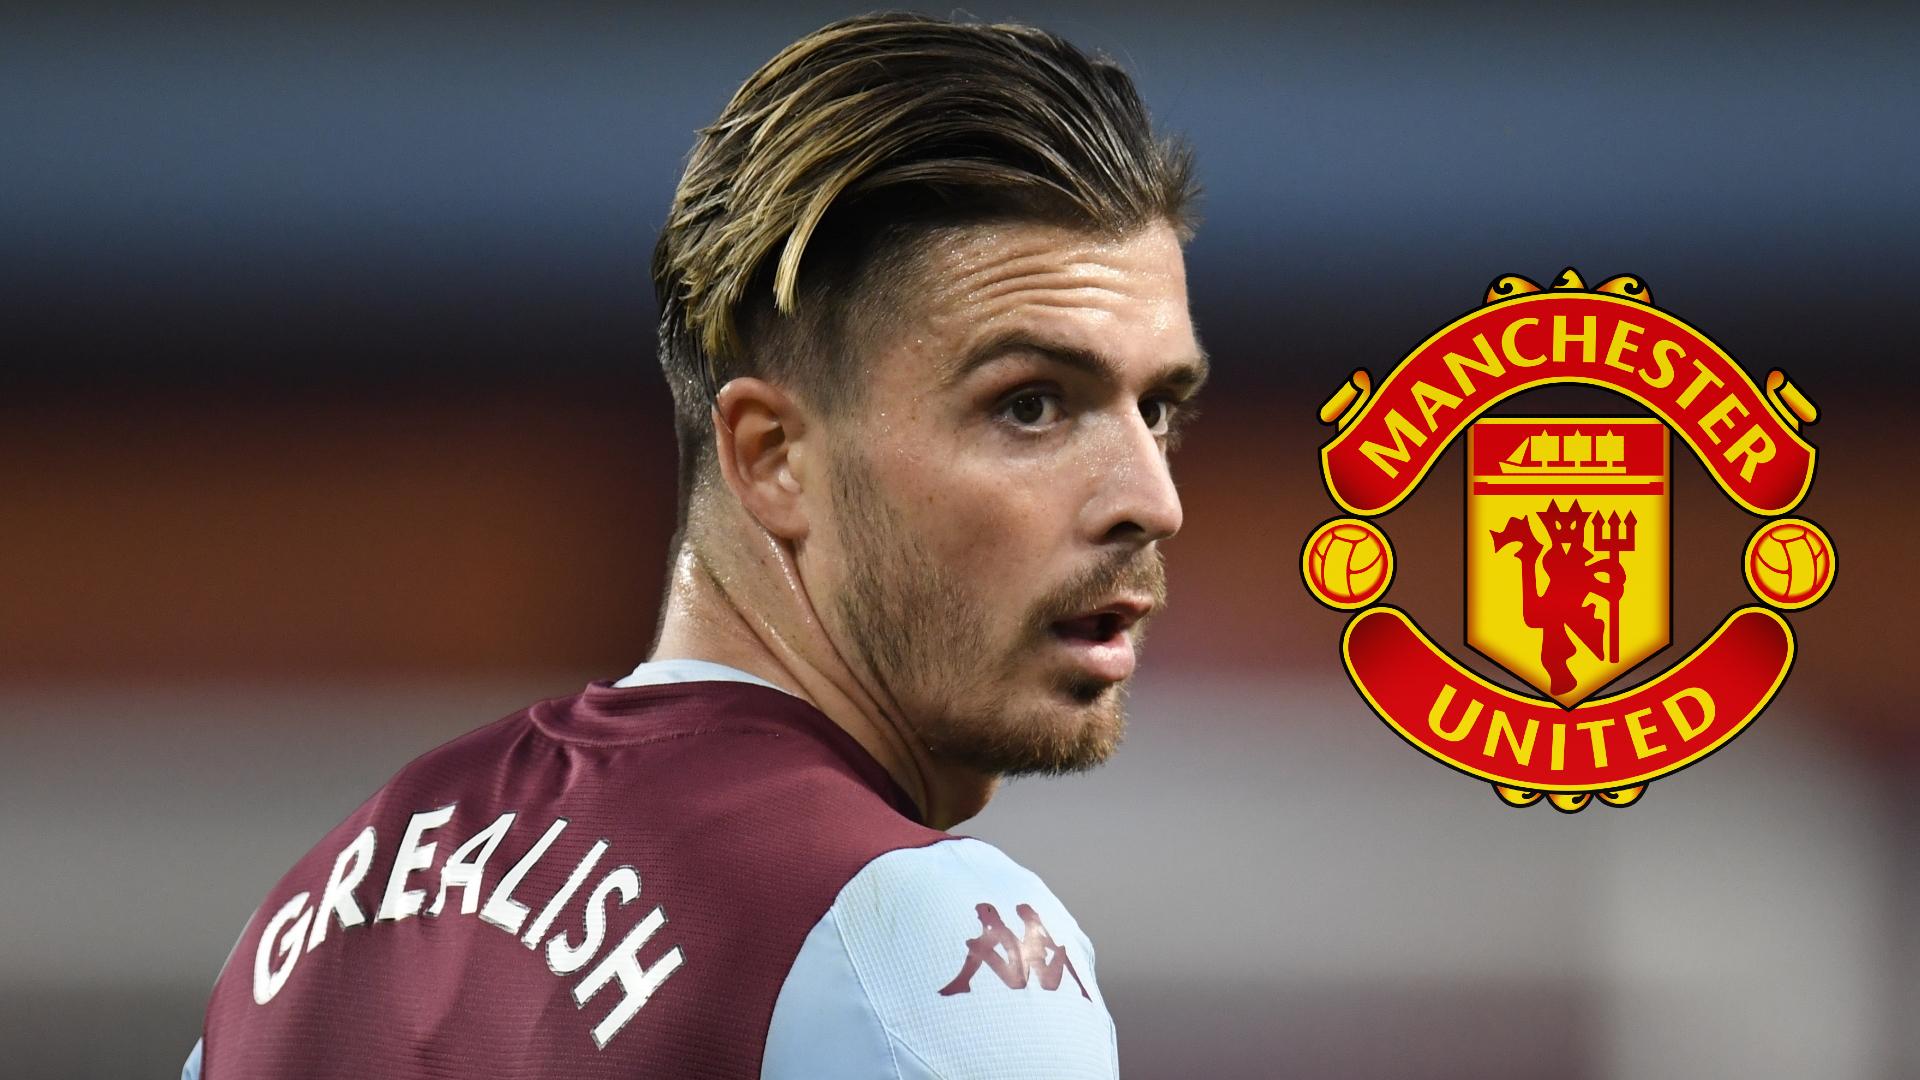 Transfer News And Rumours Live Man Utd Rekindle Grealish Interest Goal Com